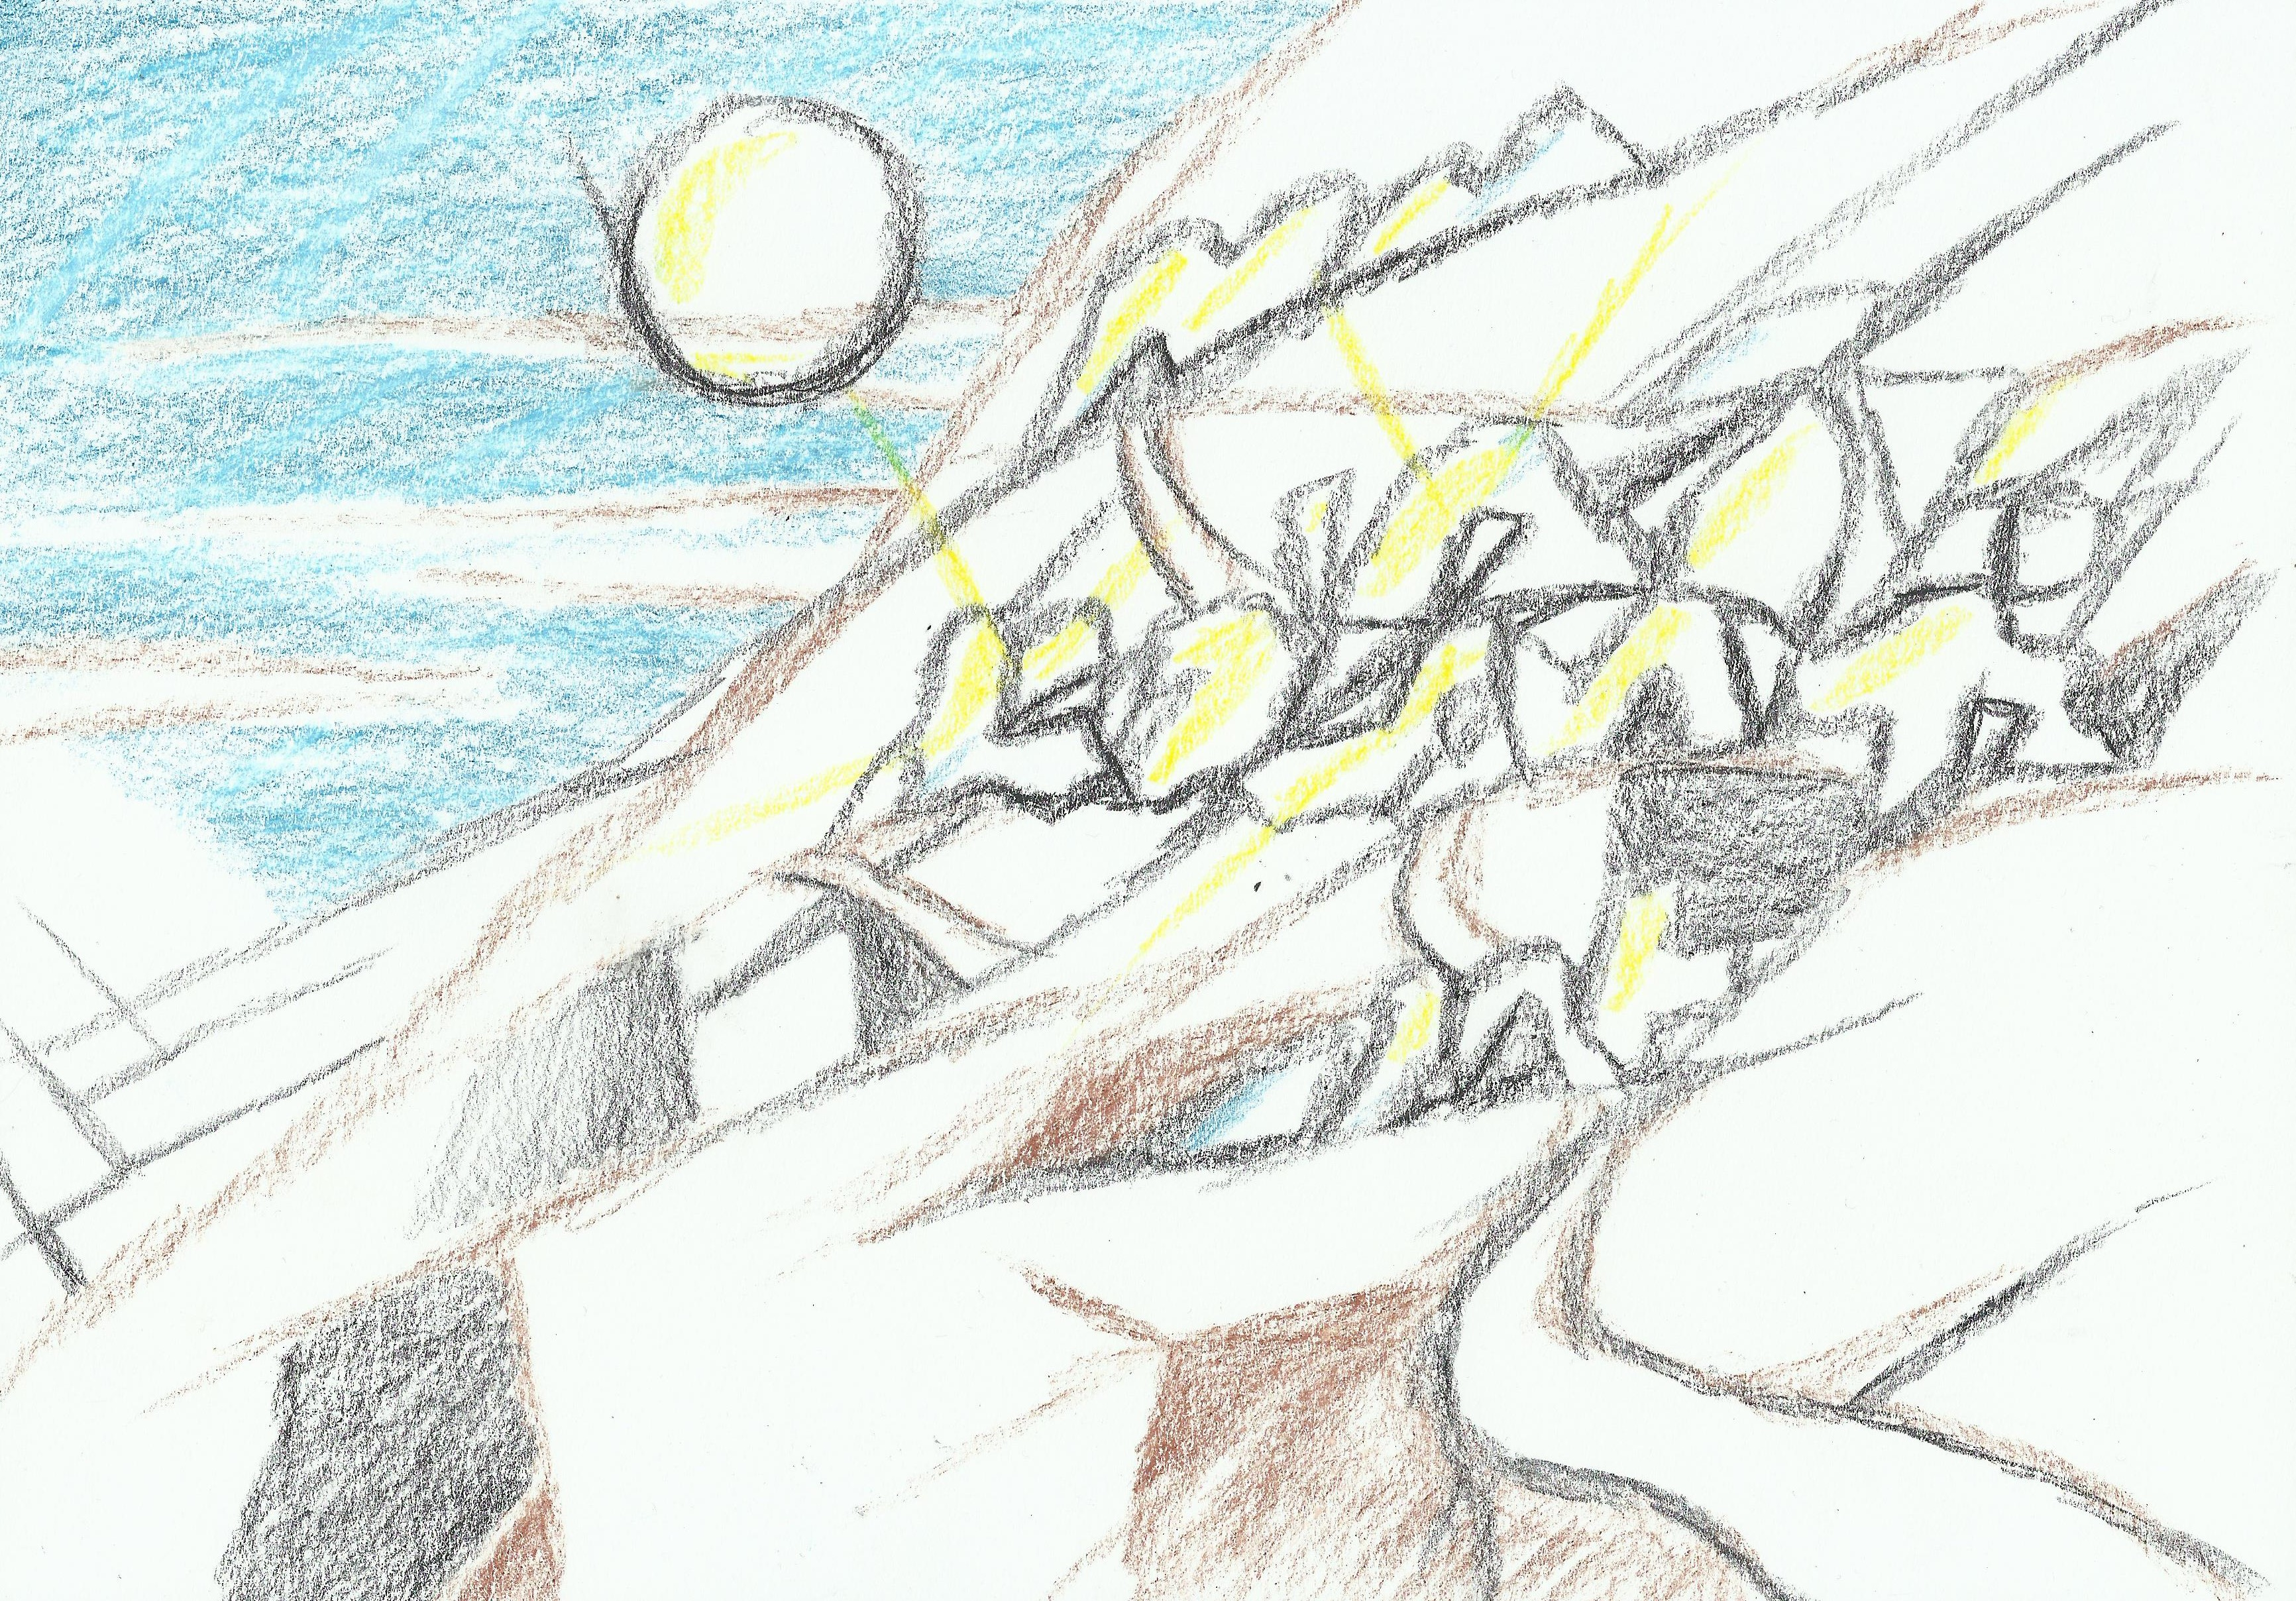 High mountain vision